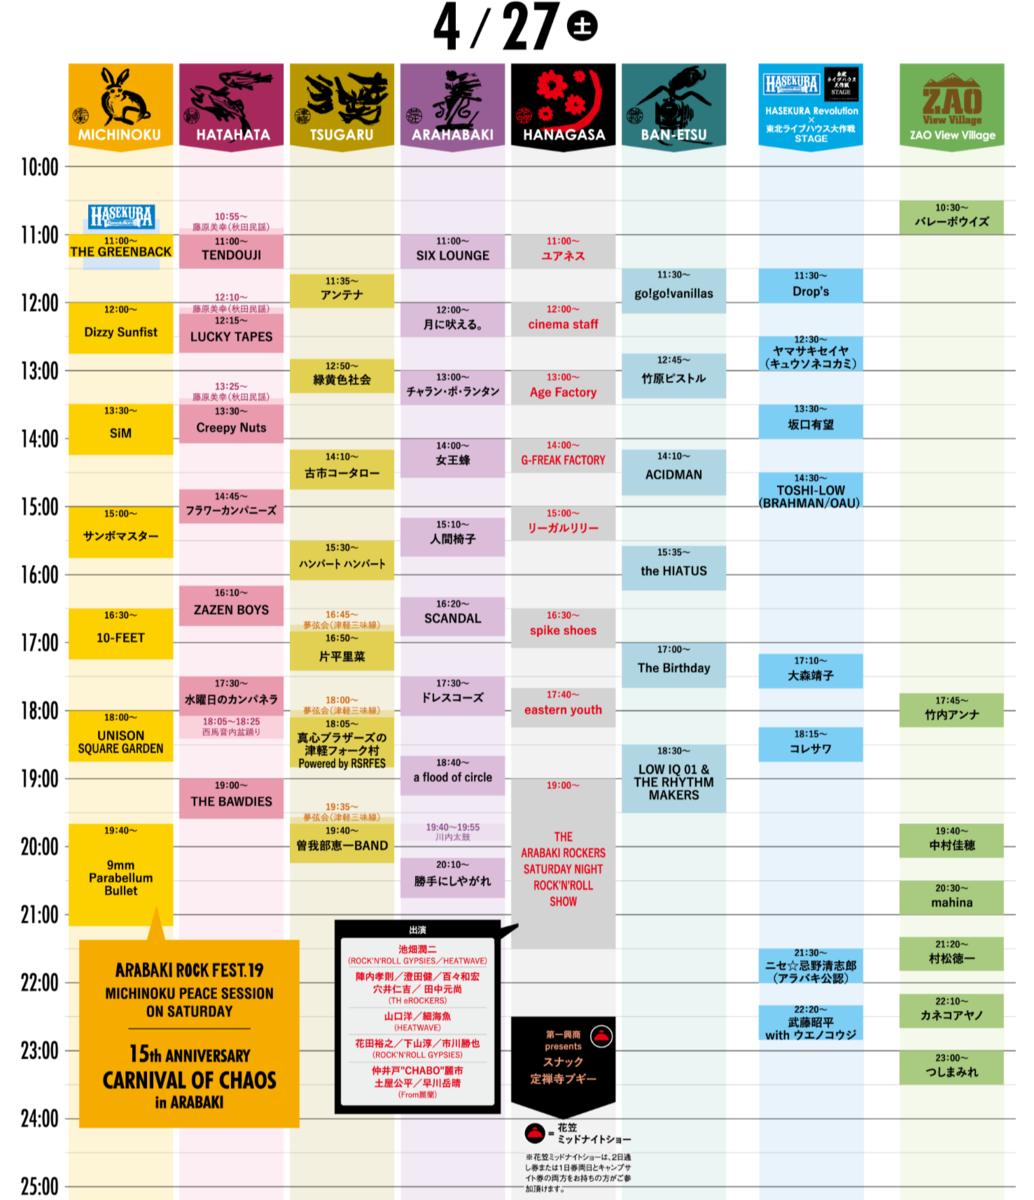 ARABAKI ROCK FEST2019,5月27日タイムテーブル